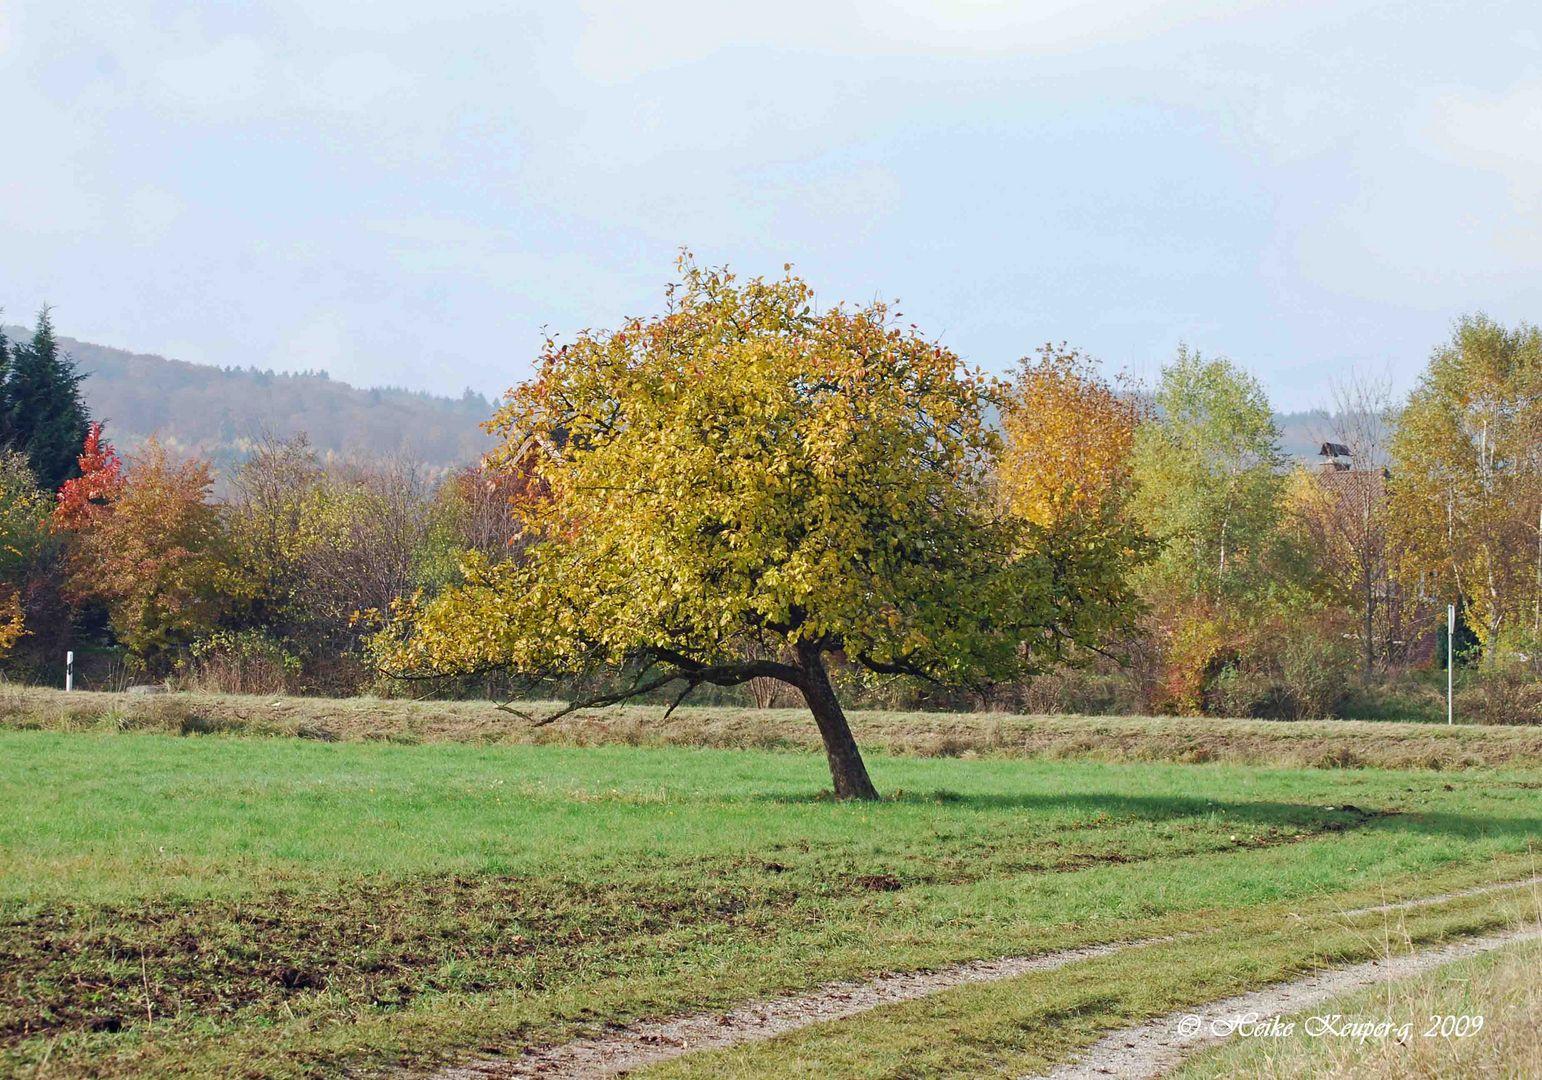 Apfelbaum im Herbstbunt